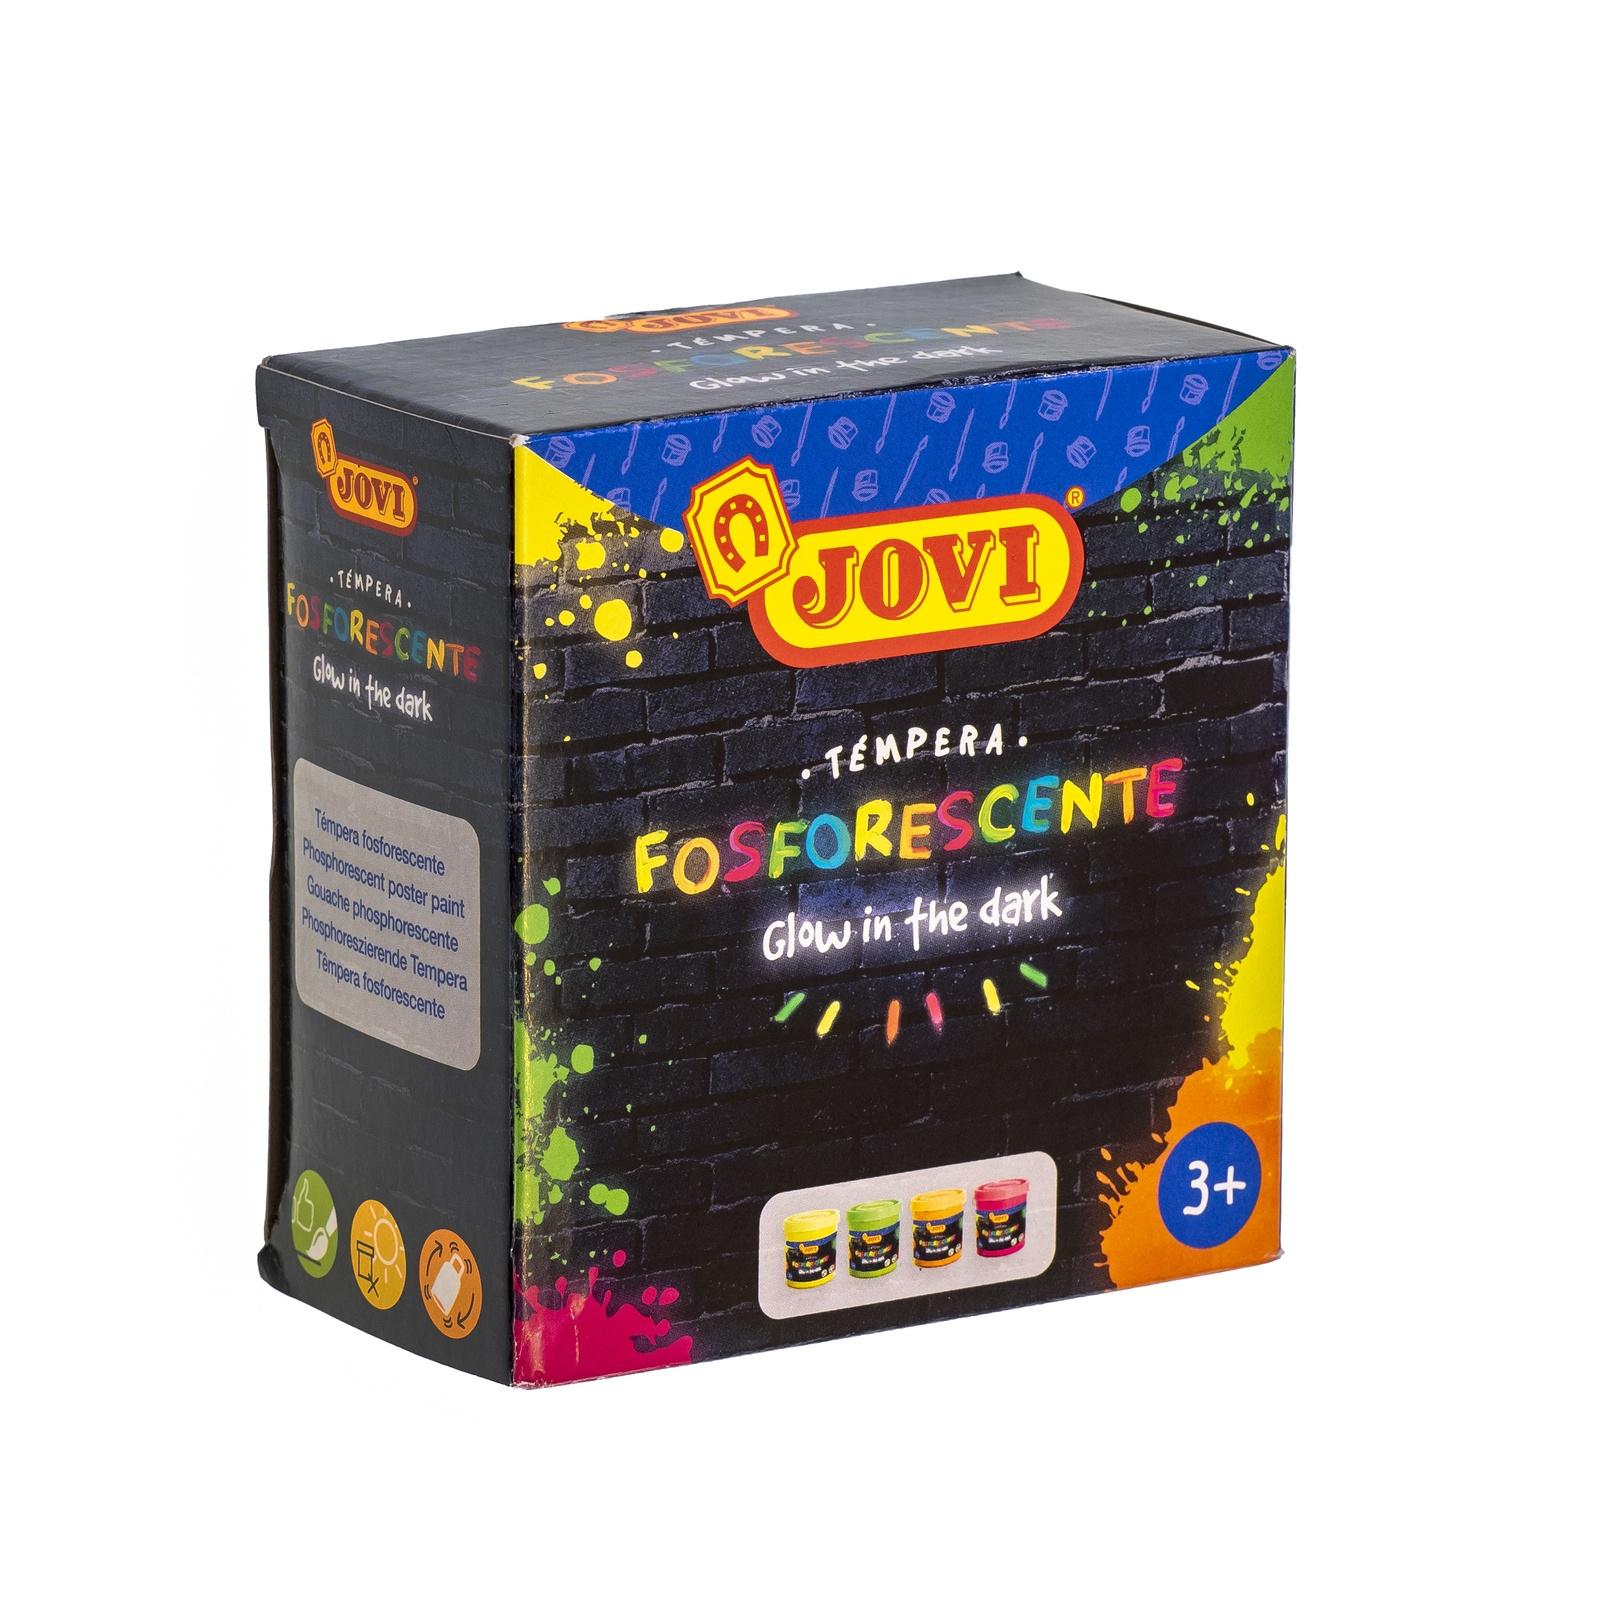 Гуашь JOVI фосфоресцентная светящаяся в темноте 4 цв х55мл краски jovi краски для рисования руками jovi 5 цв 35 мл